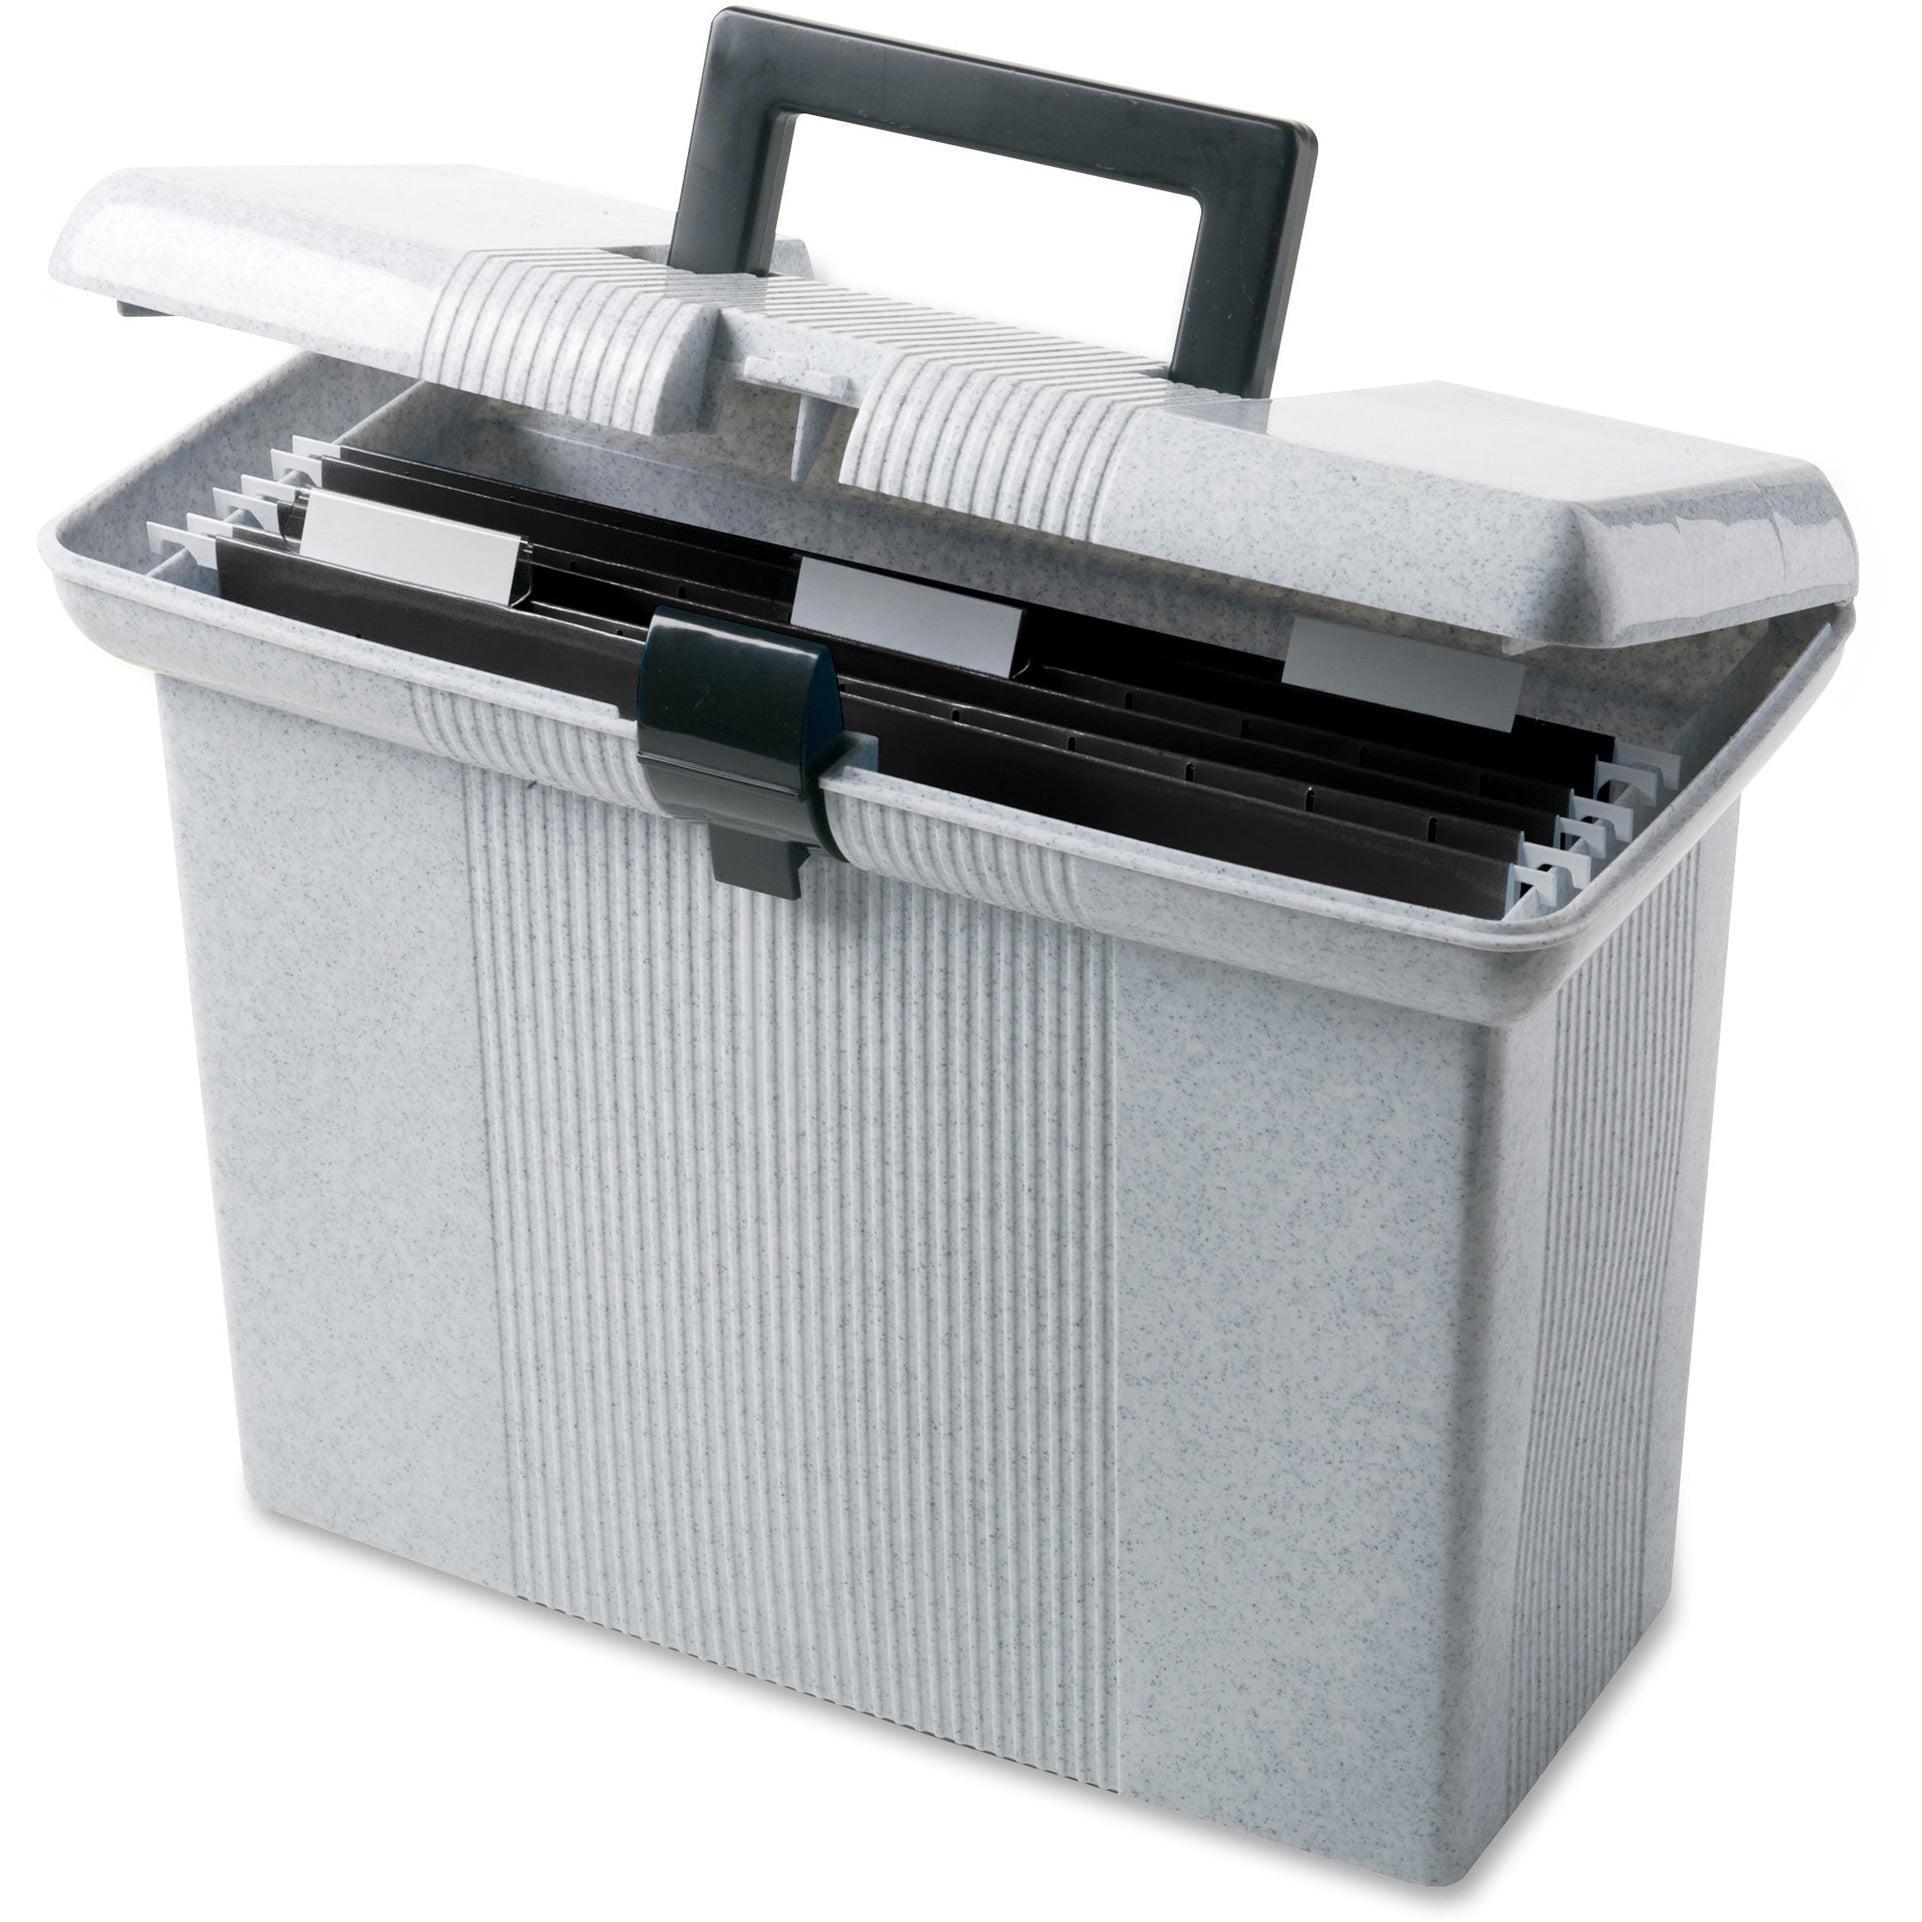 Pendaflex, PFX41737, Portafile File Storage Box, 1 Each, Granite - Walmart.com